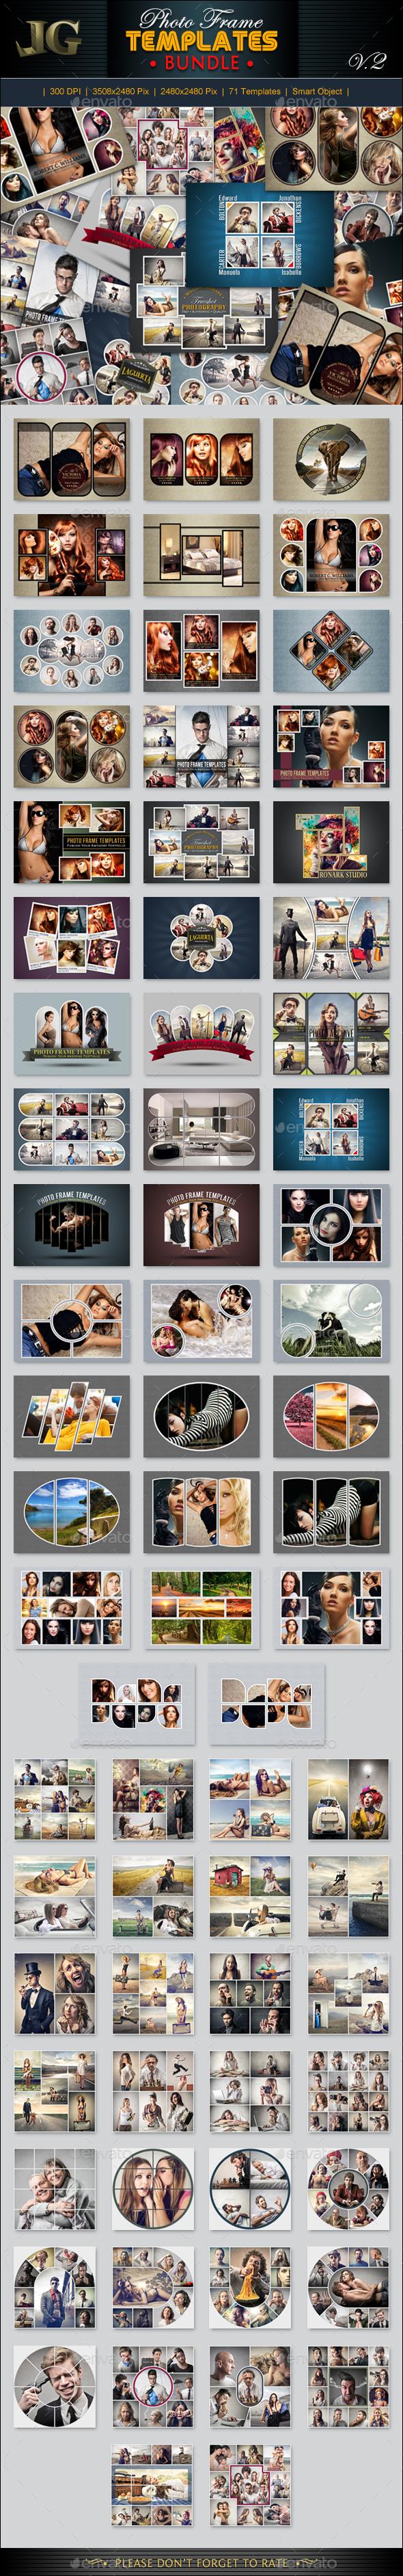 Photo Frame Templates Bundle V2 - Miscellaneous Photo Templates